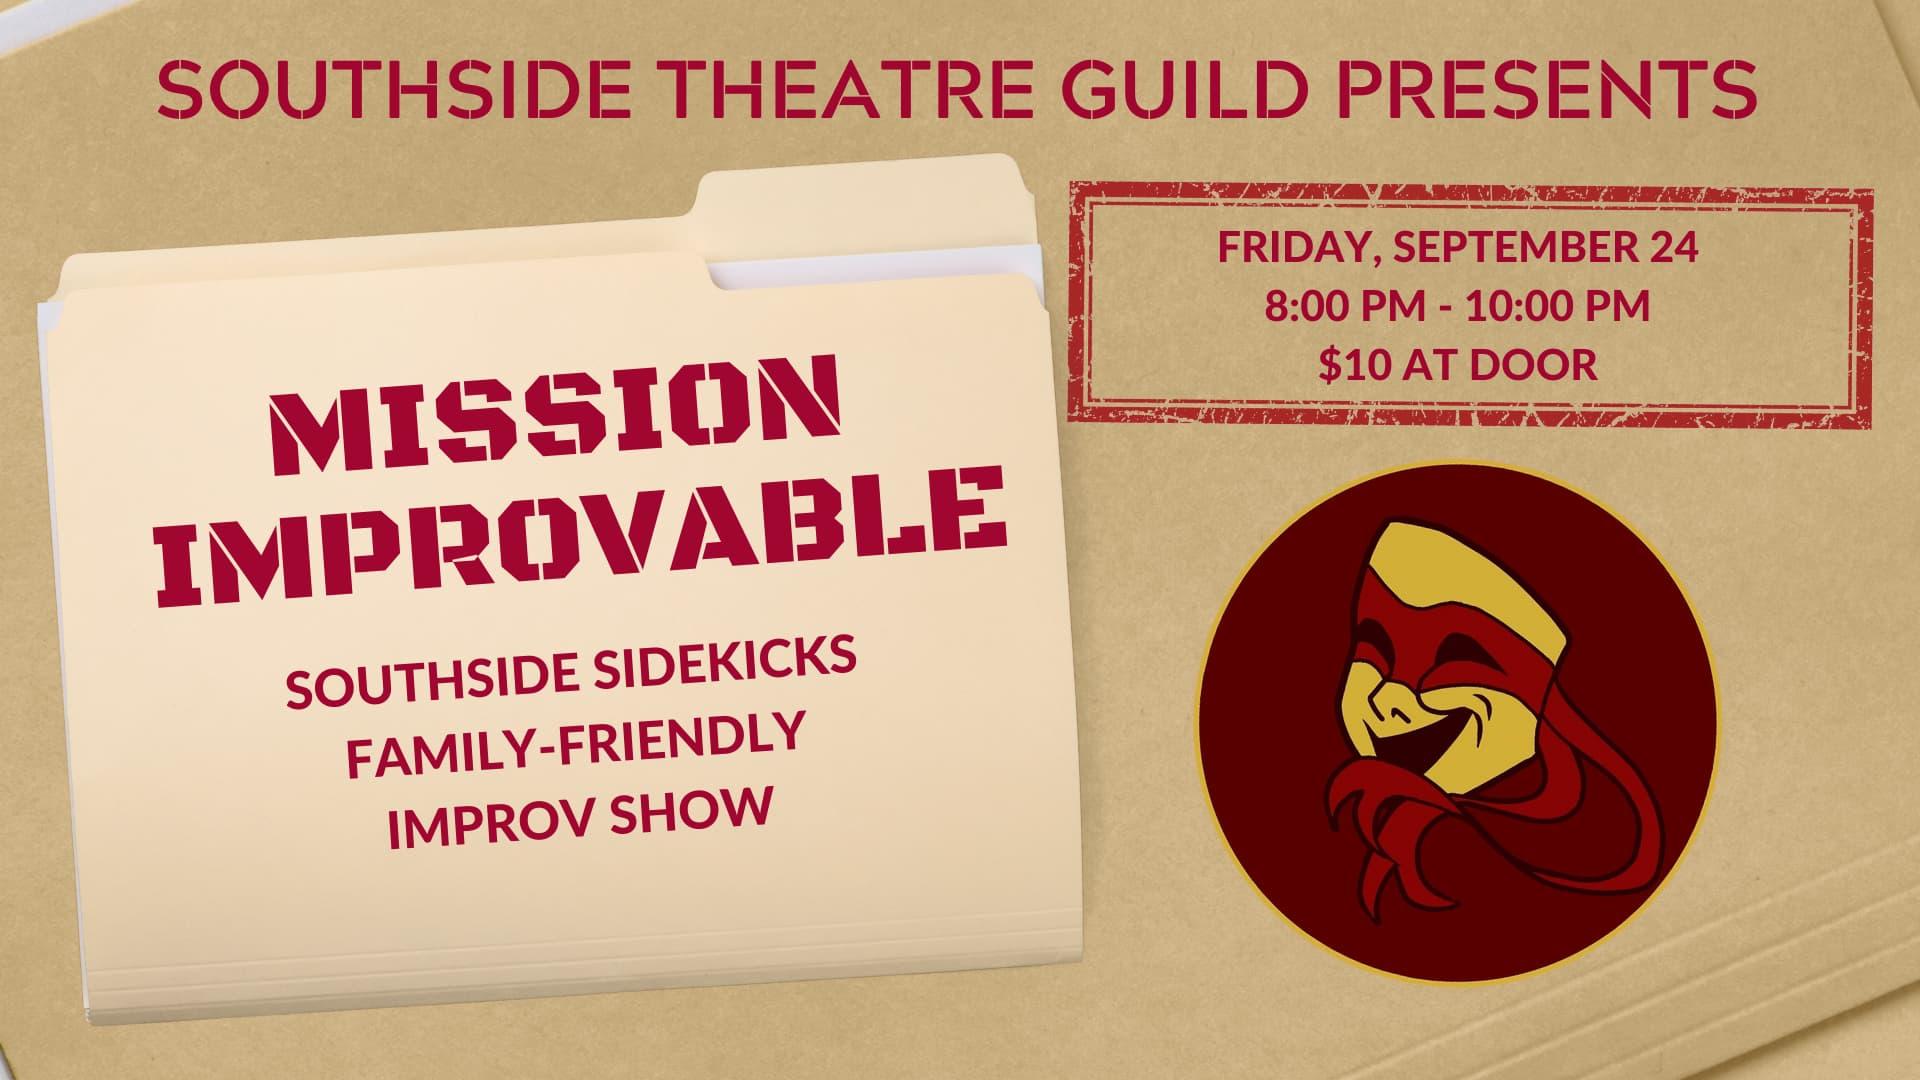 Southside Sidekicks present Mission: Improvable